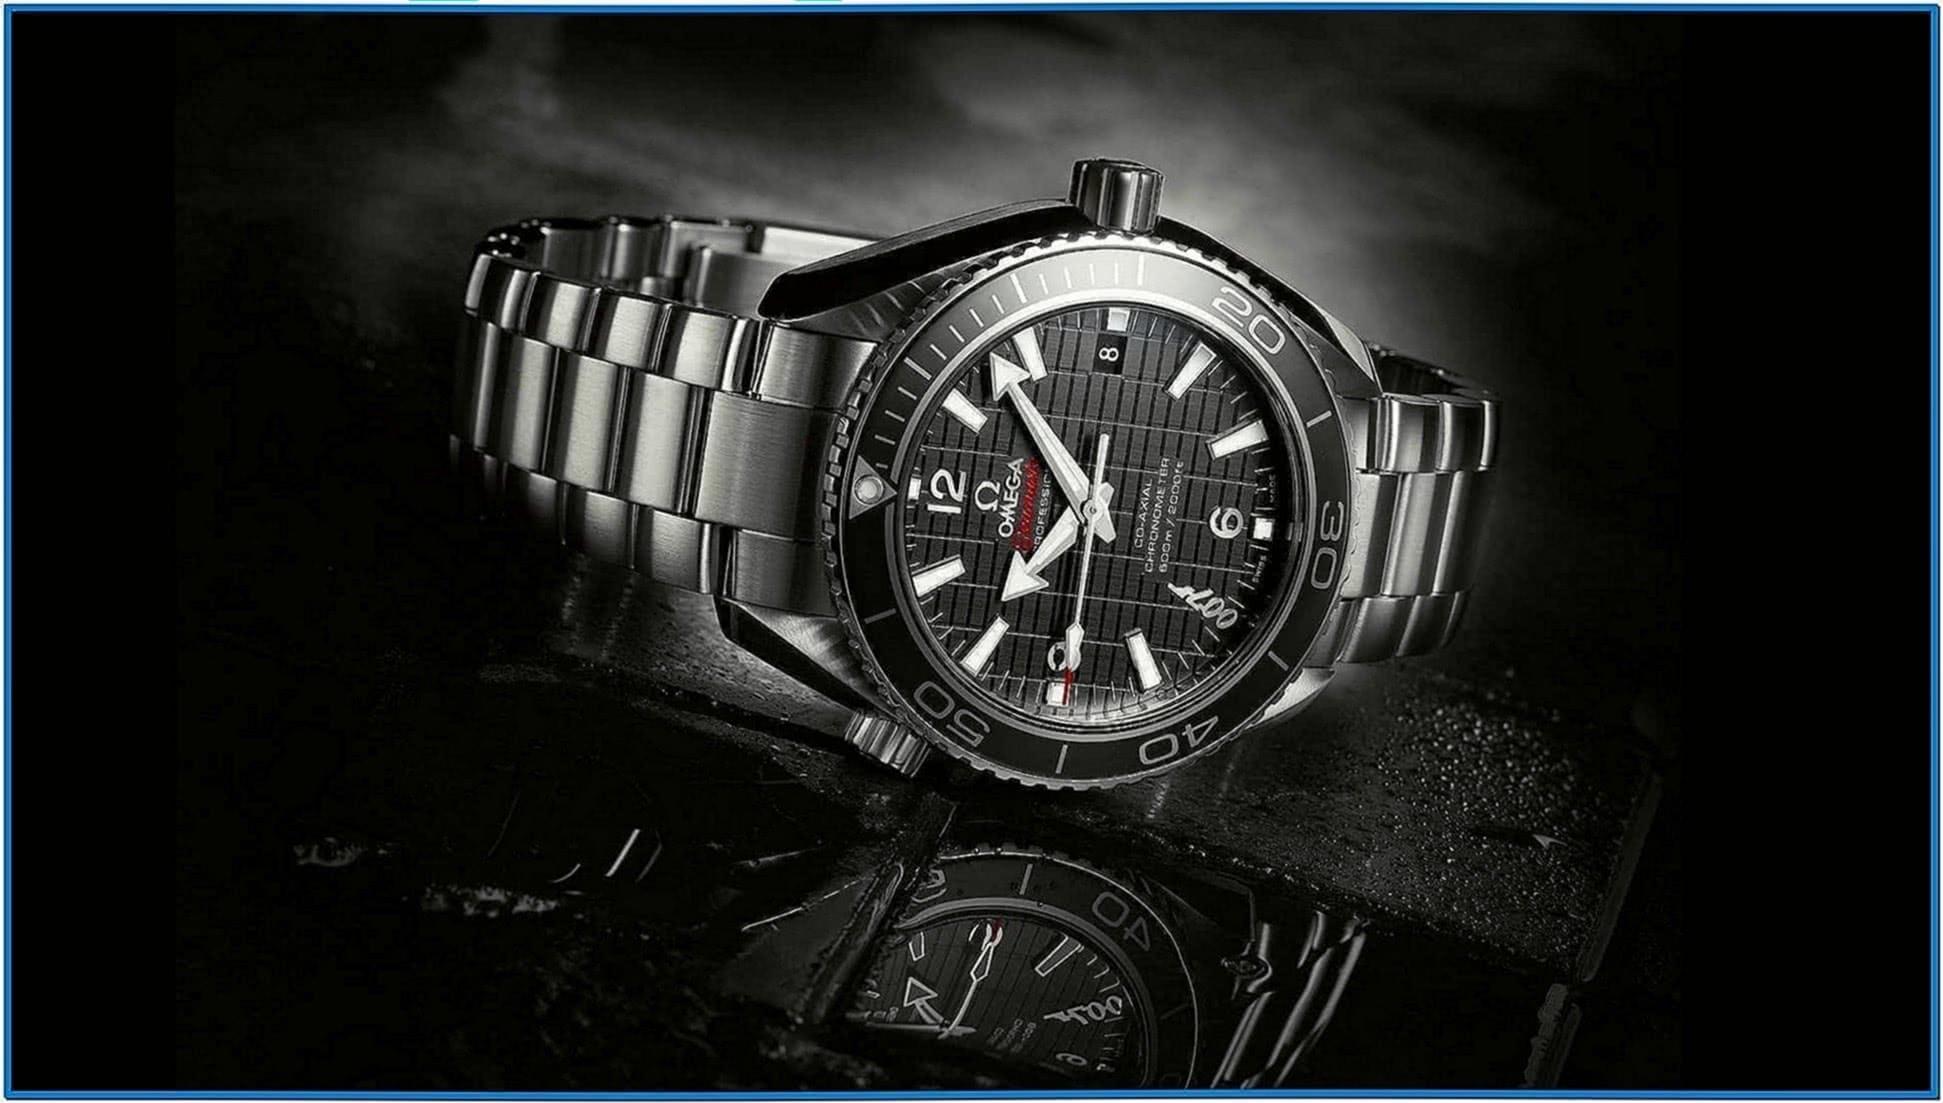 Omega watch screensaver